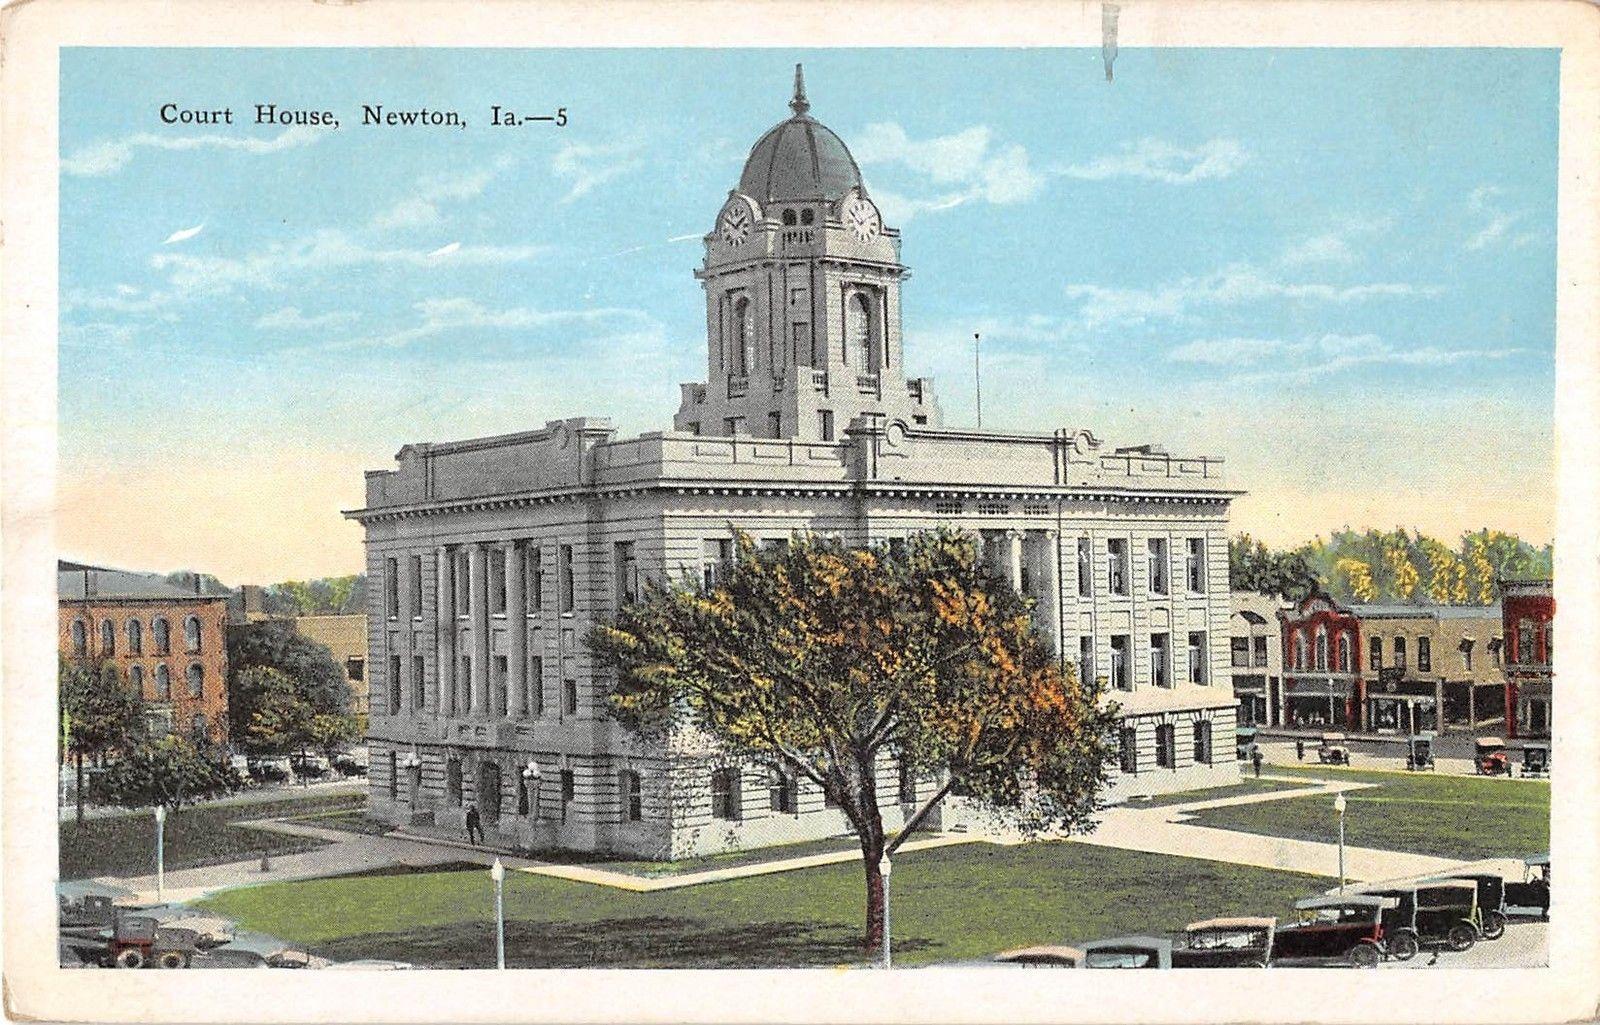 Newton Iowa Court House General View Antique Postcard V5725 Ebay